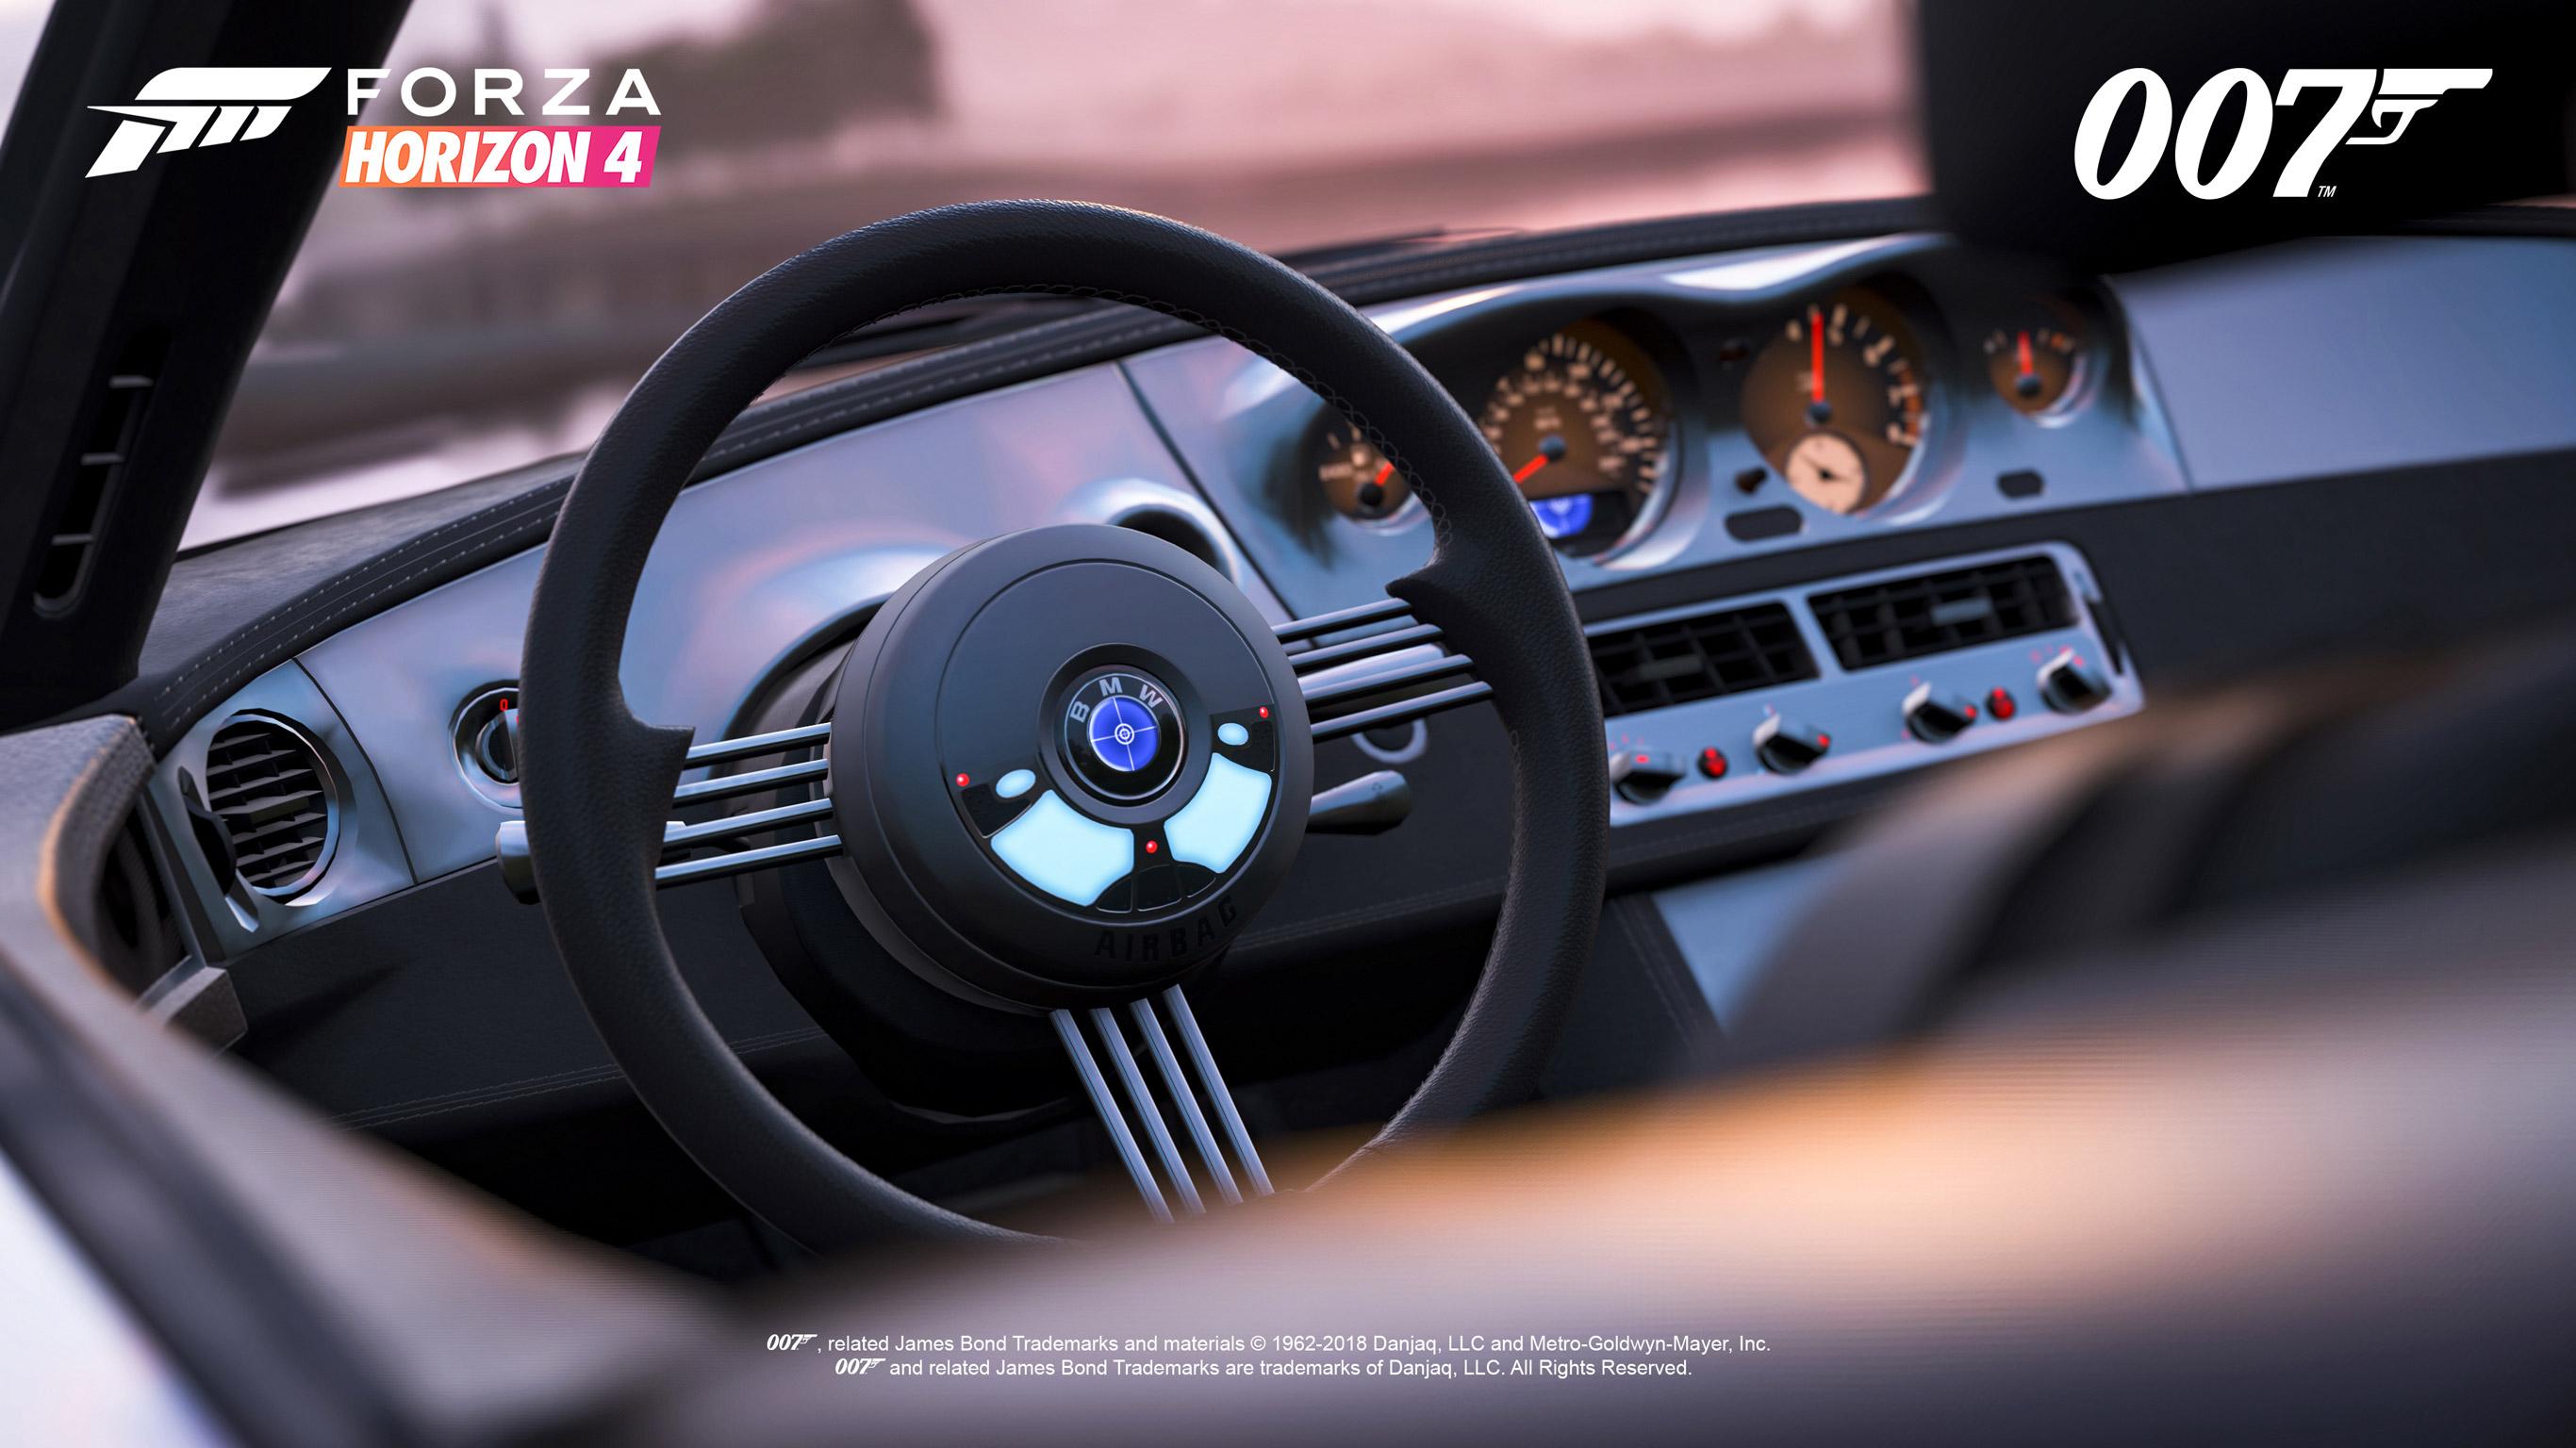 Forza Horizon 4 Wallpaper in 1366x768